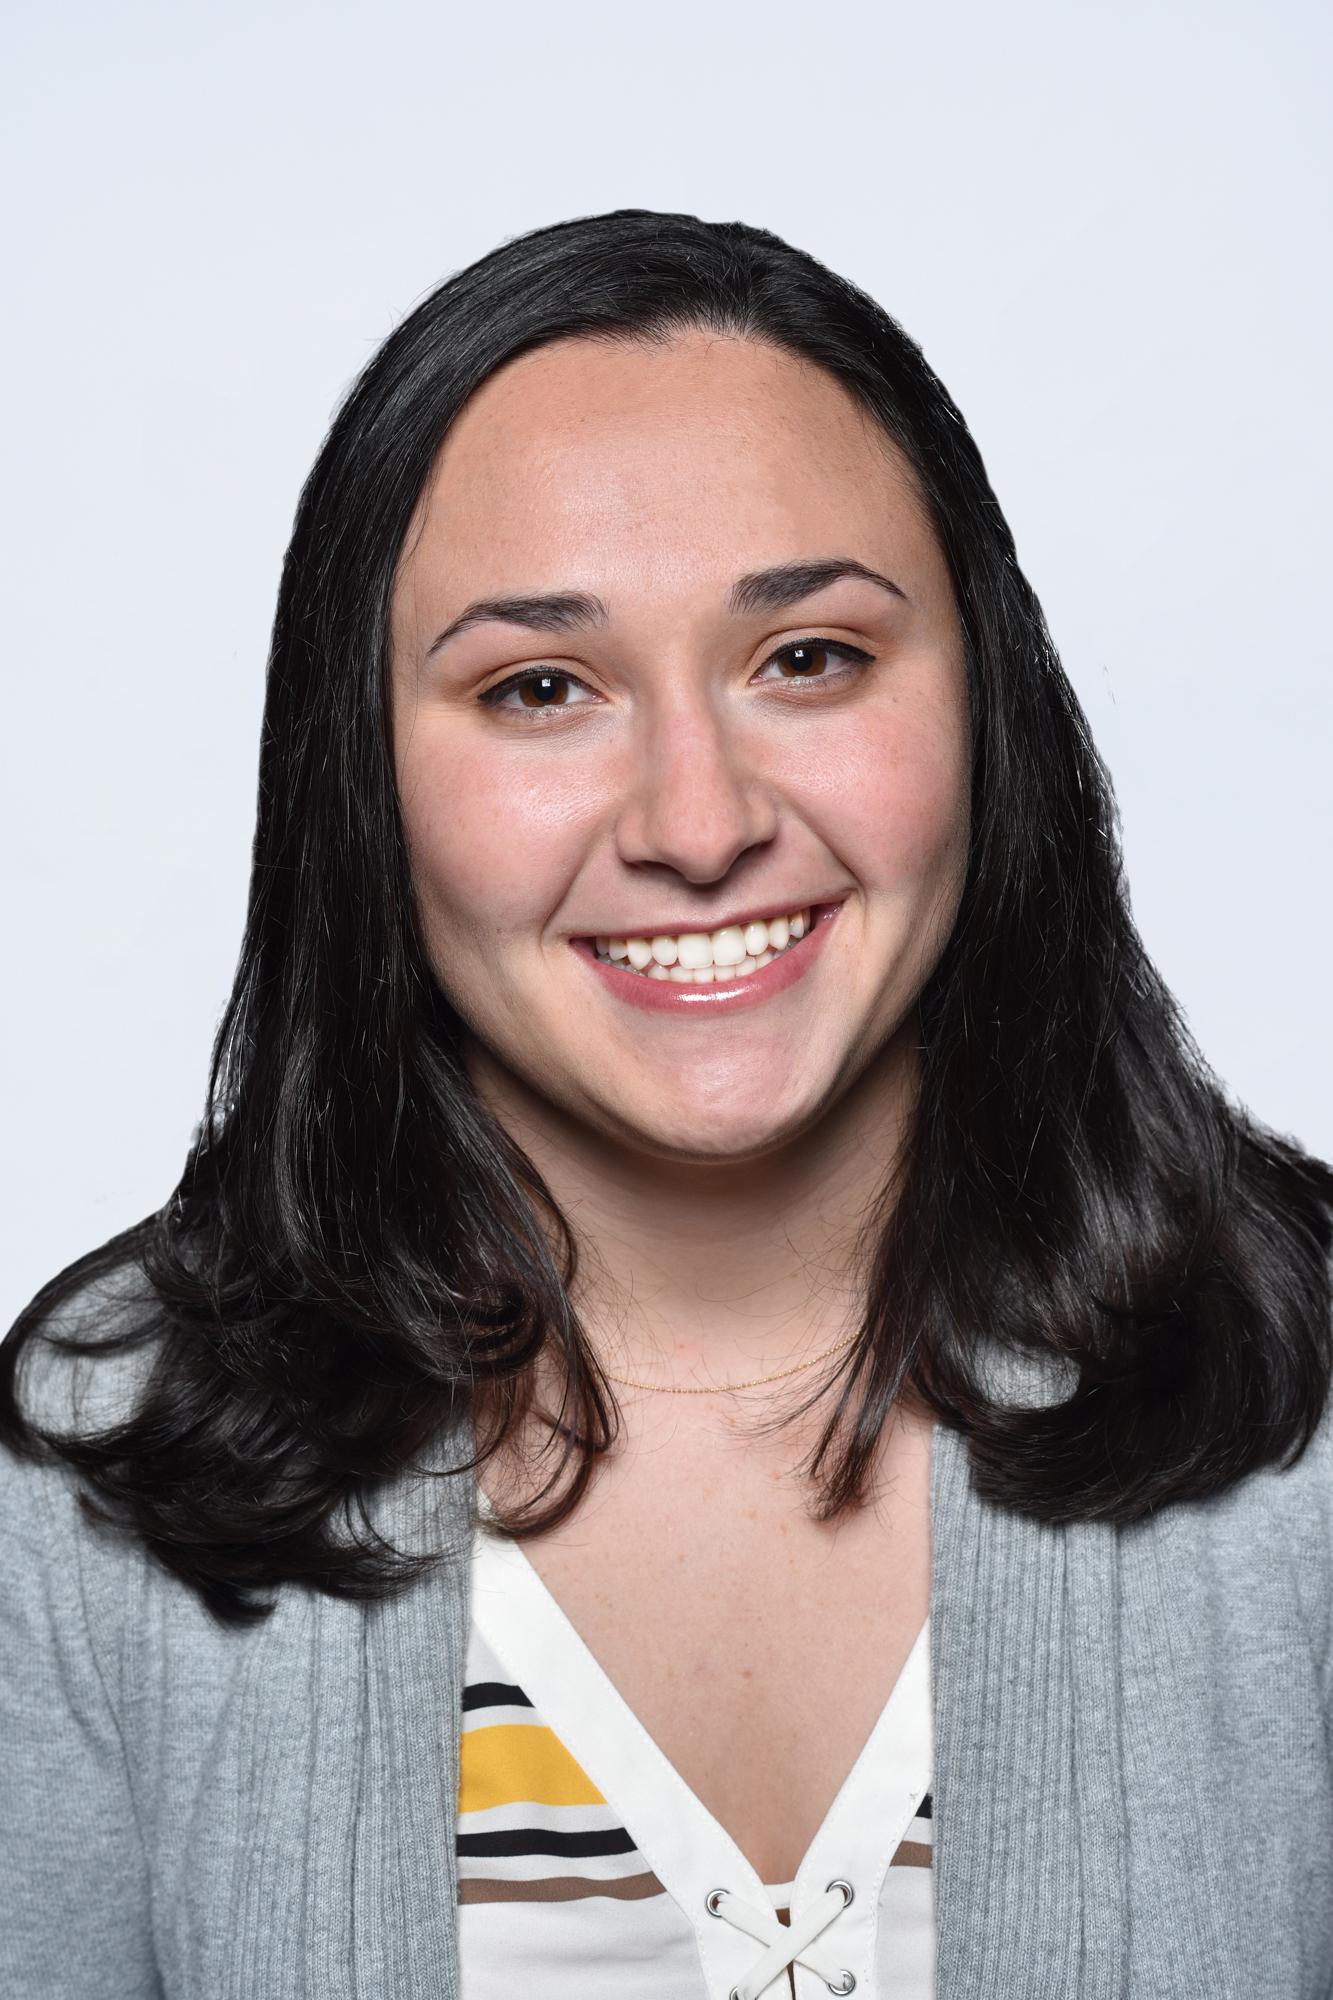 Samantha Brown Carnegie Mellon University School Of Drama